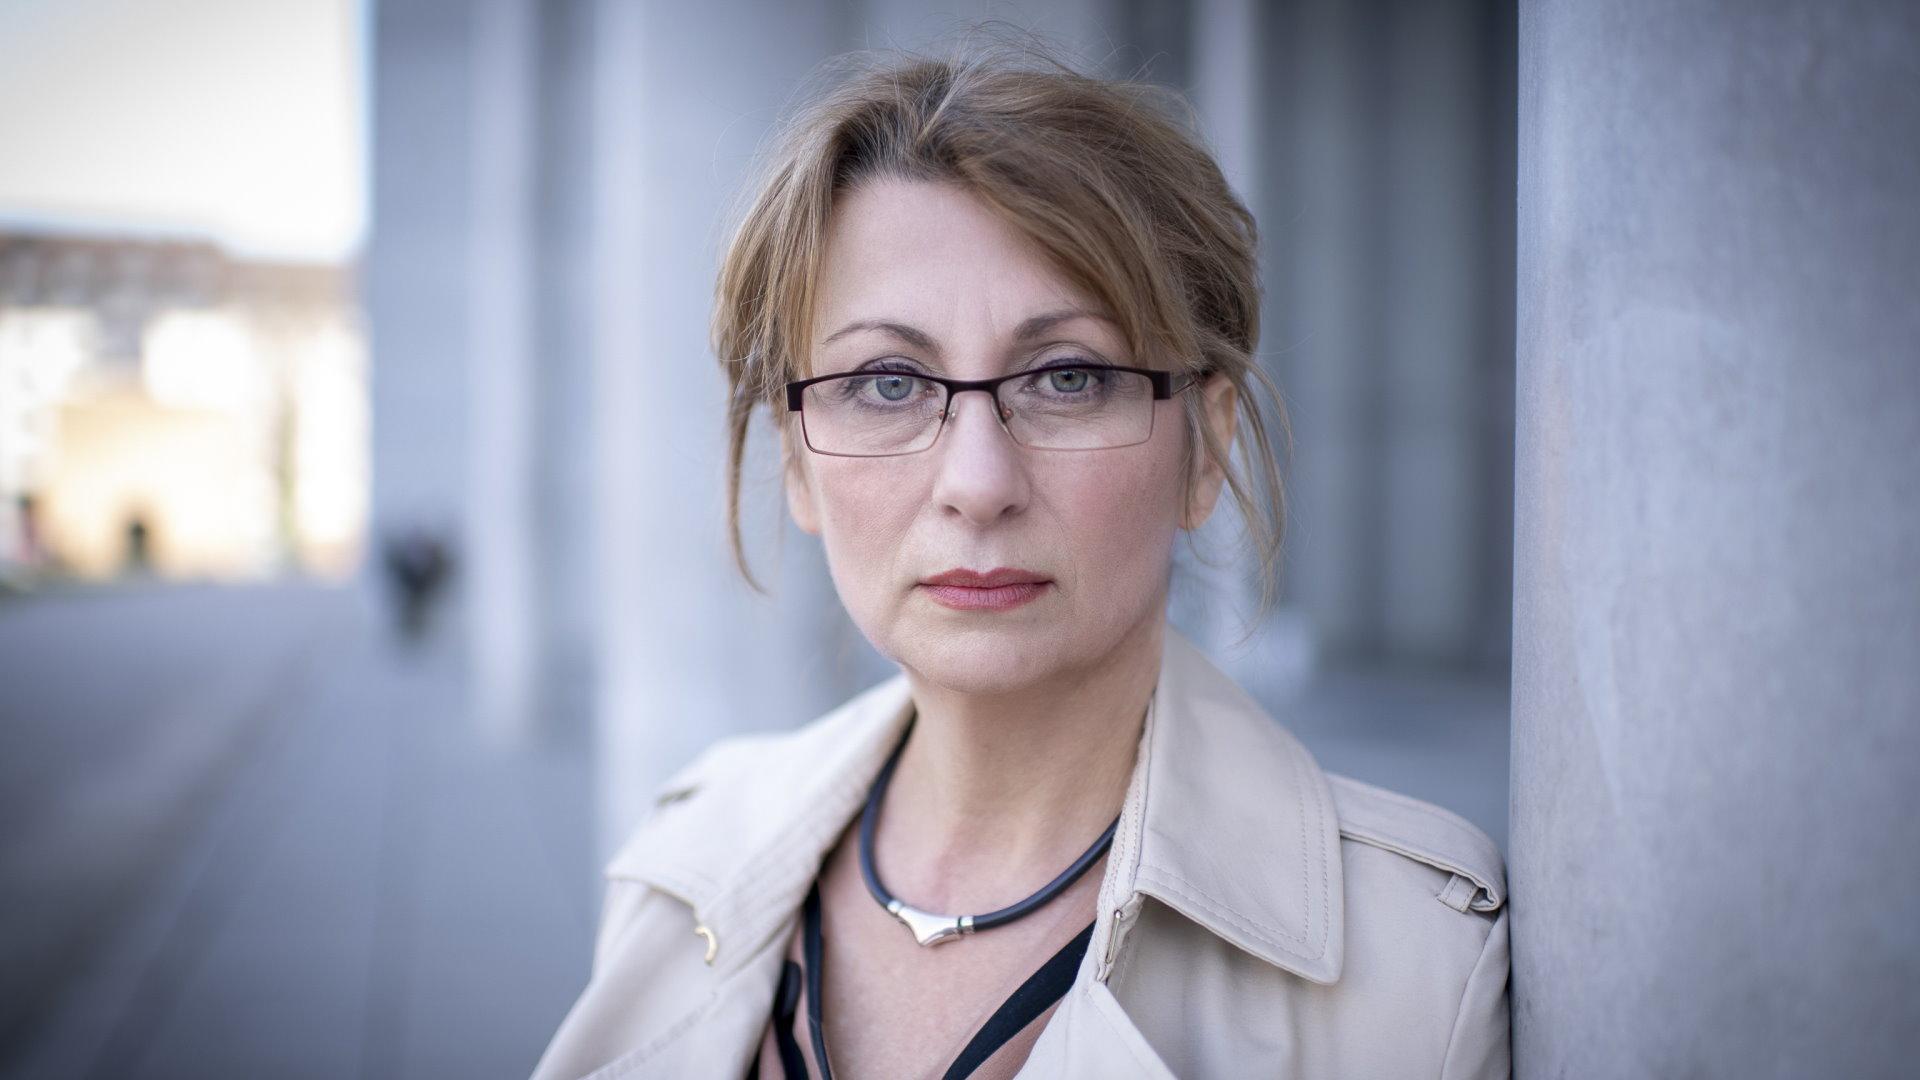 Carmen-Dorothé Moll